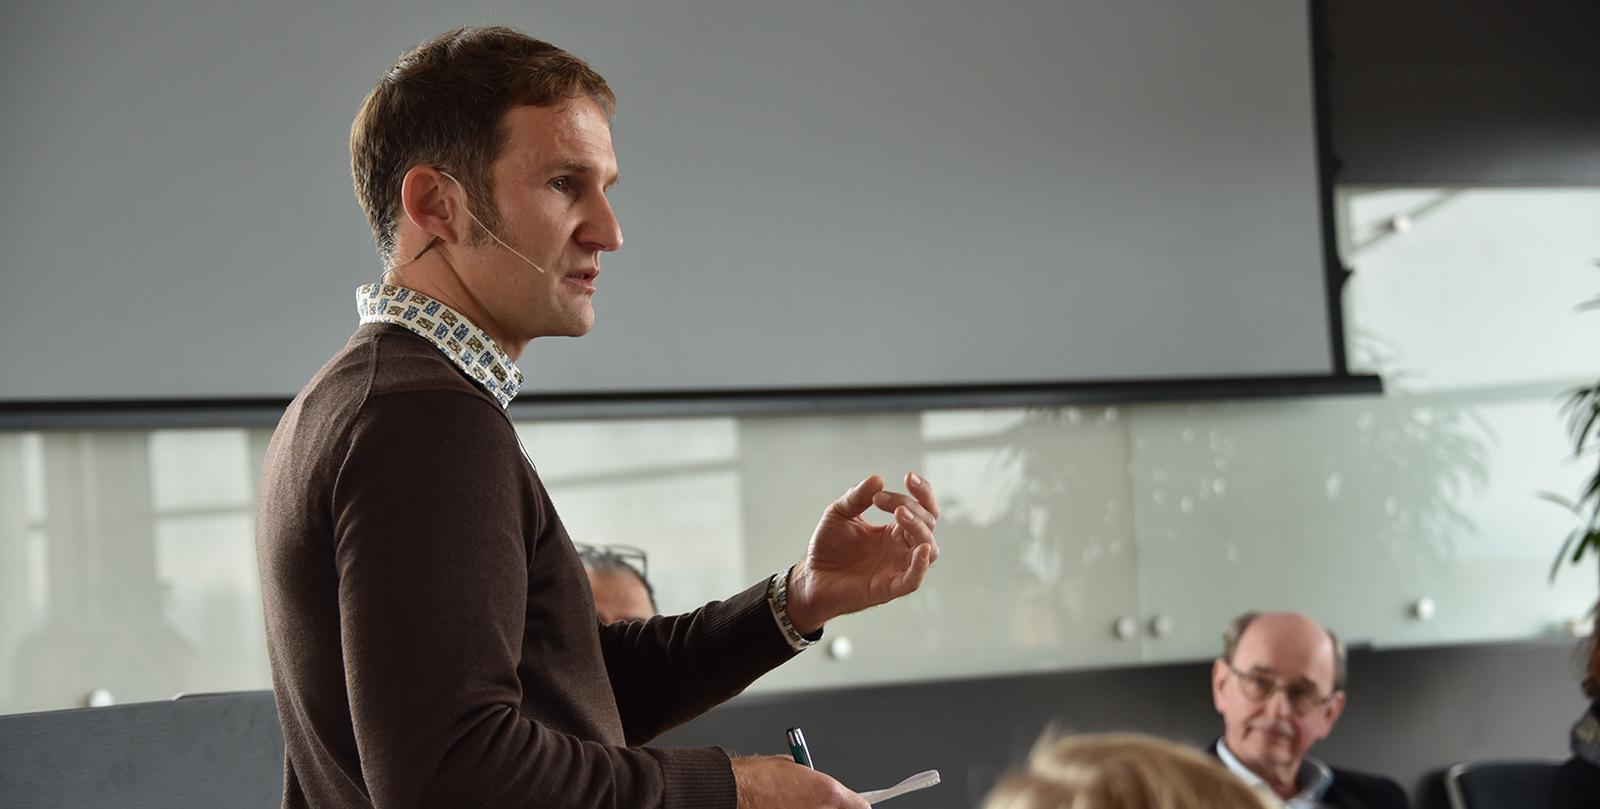 Dan Csontos teaching about grant writing